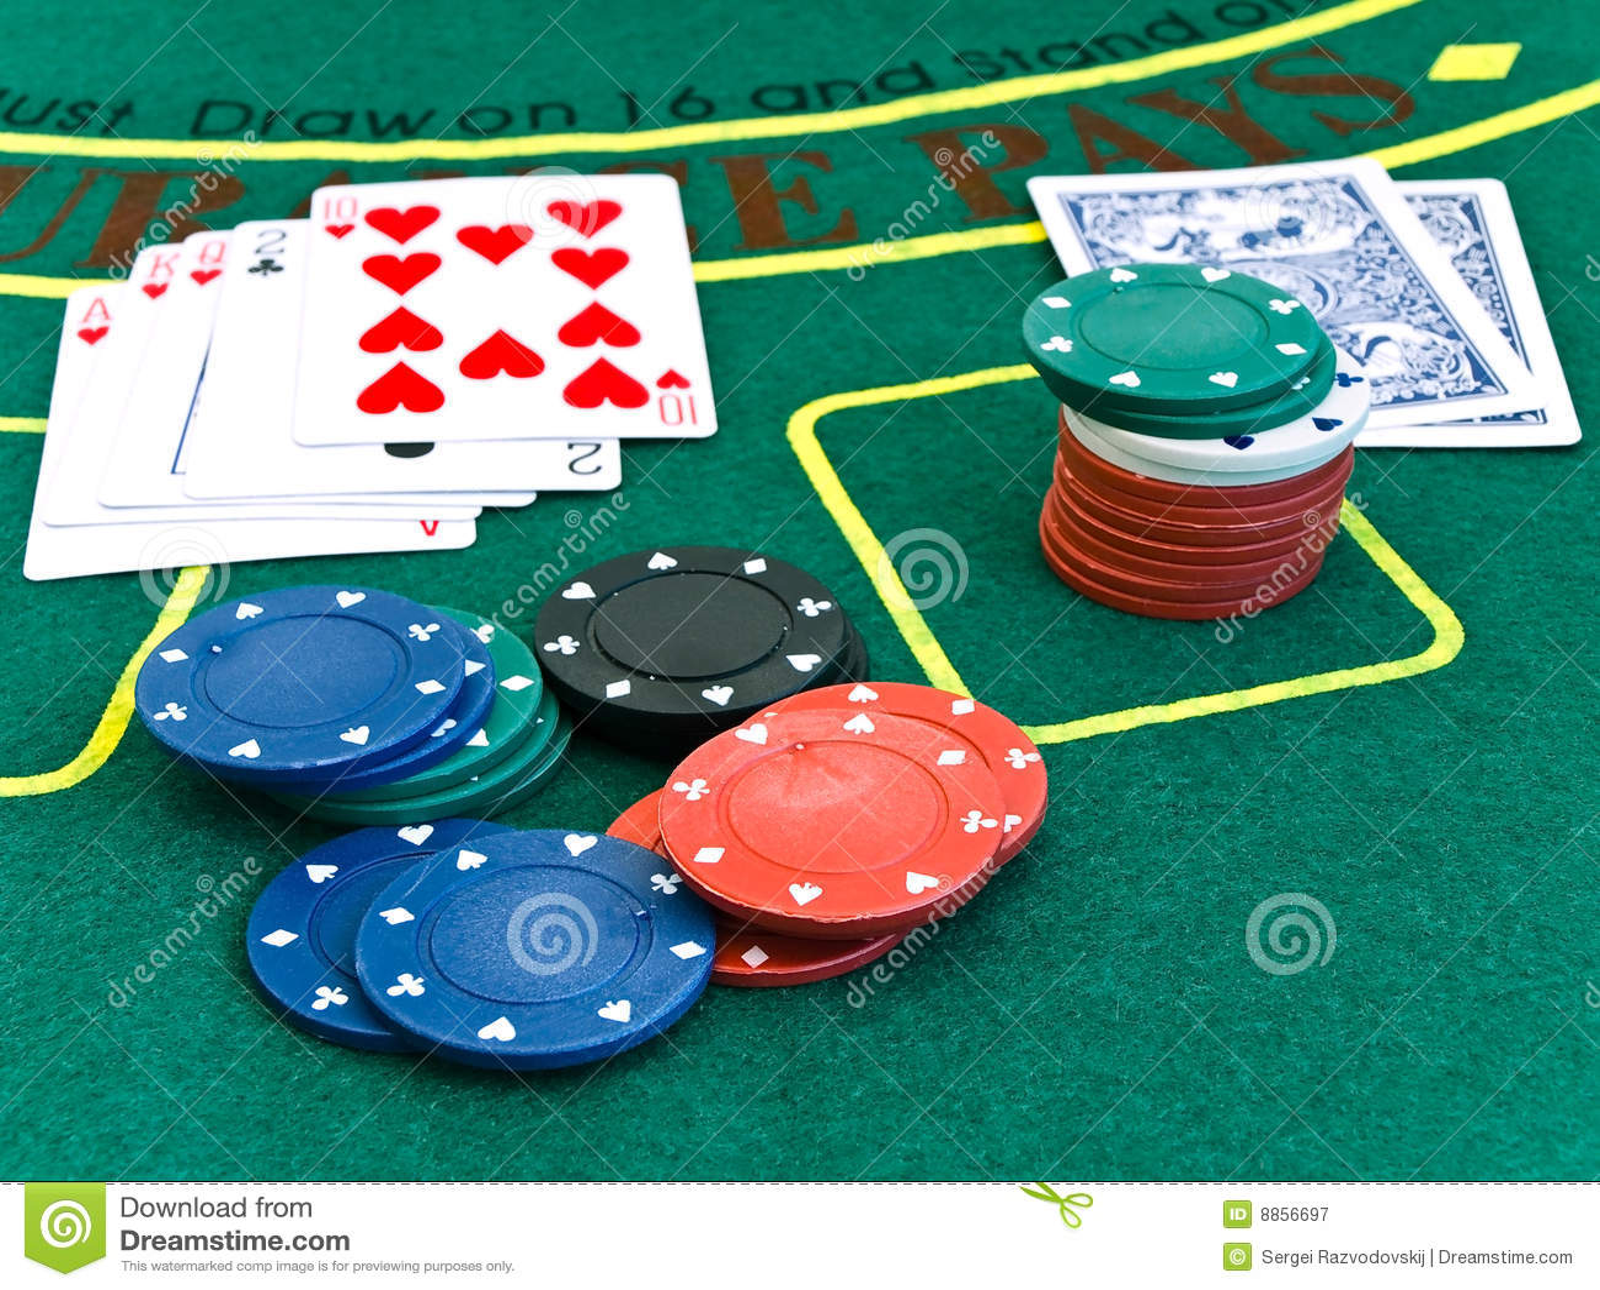 online casino roulette casino holidays